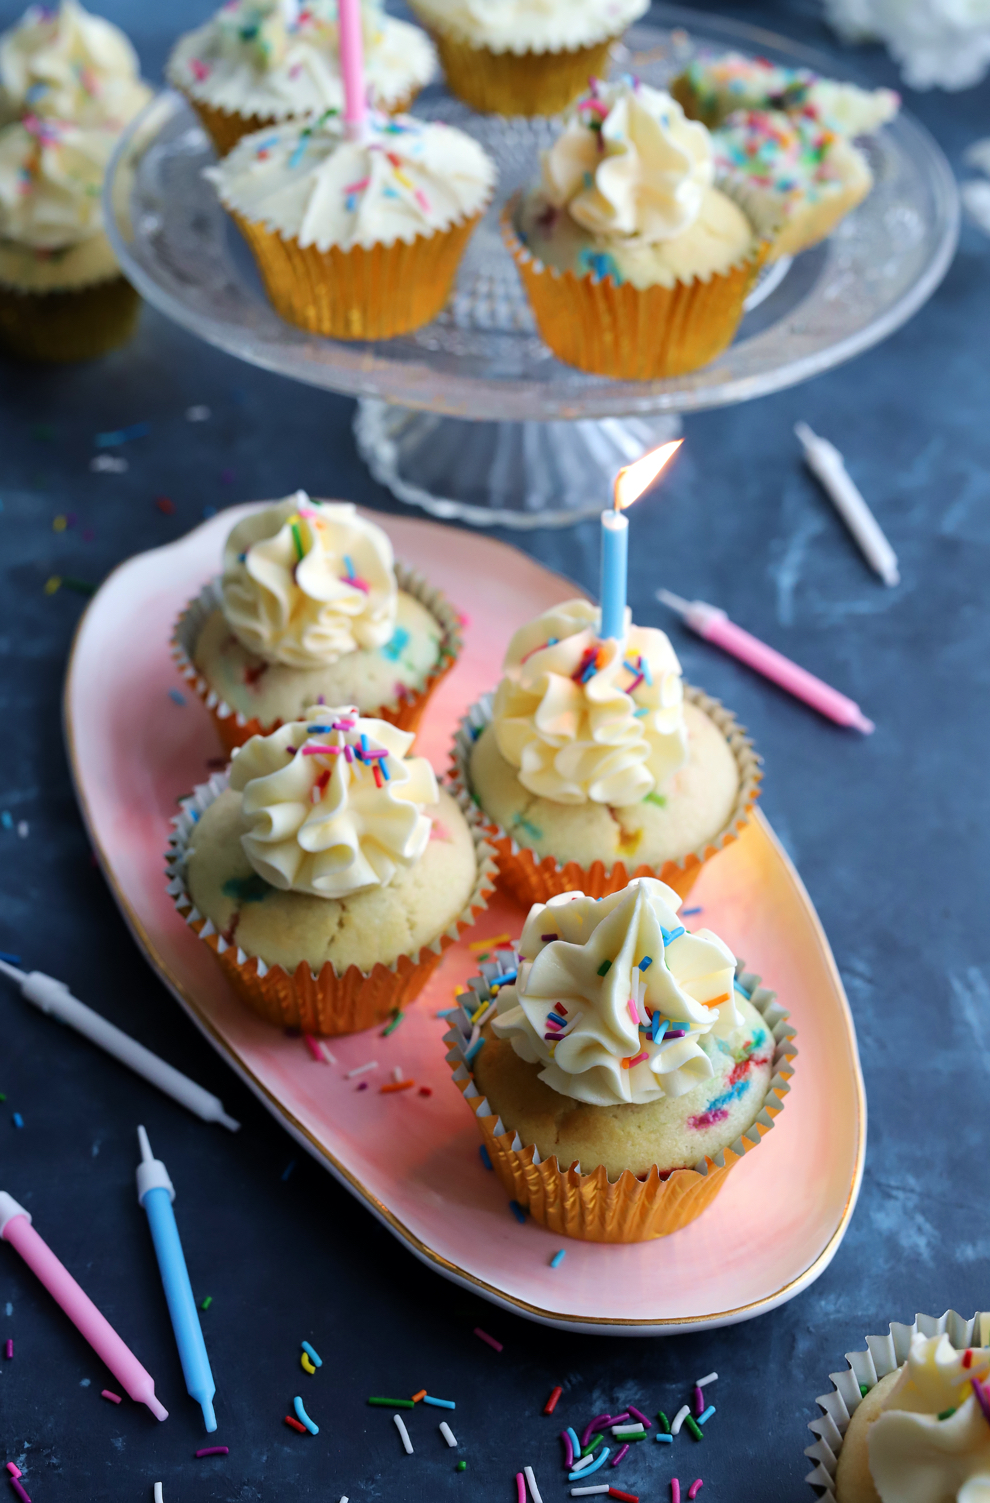 Sanjana's Fluffy Eggless Vanilla Cupcakes